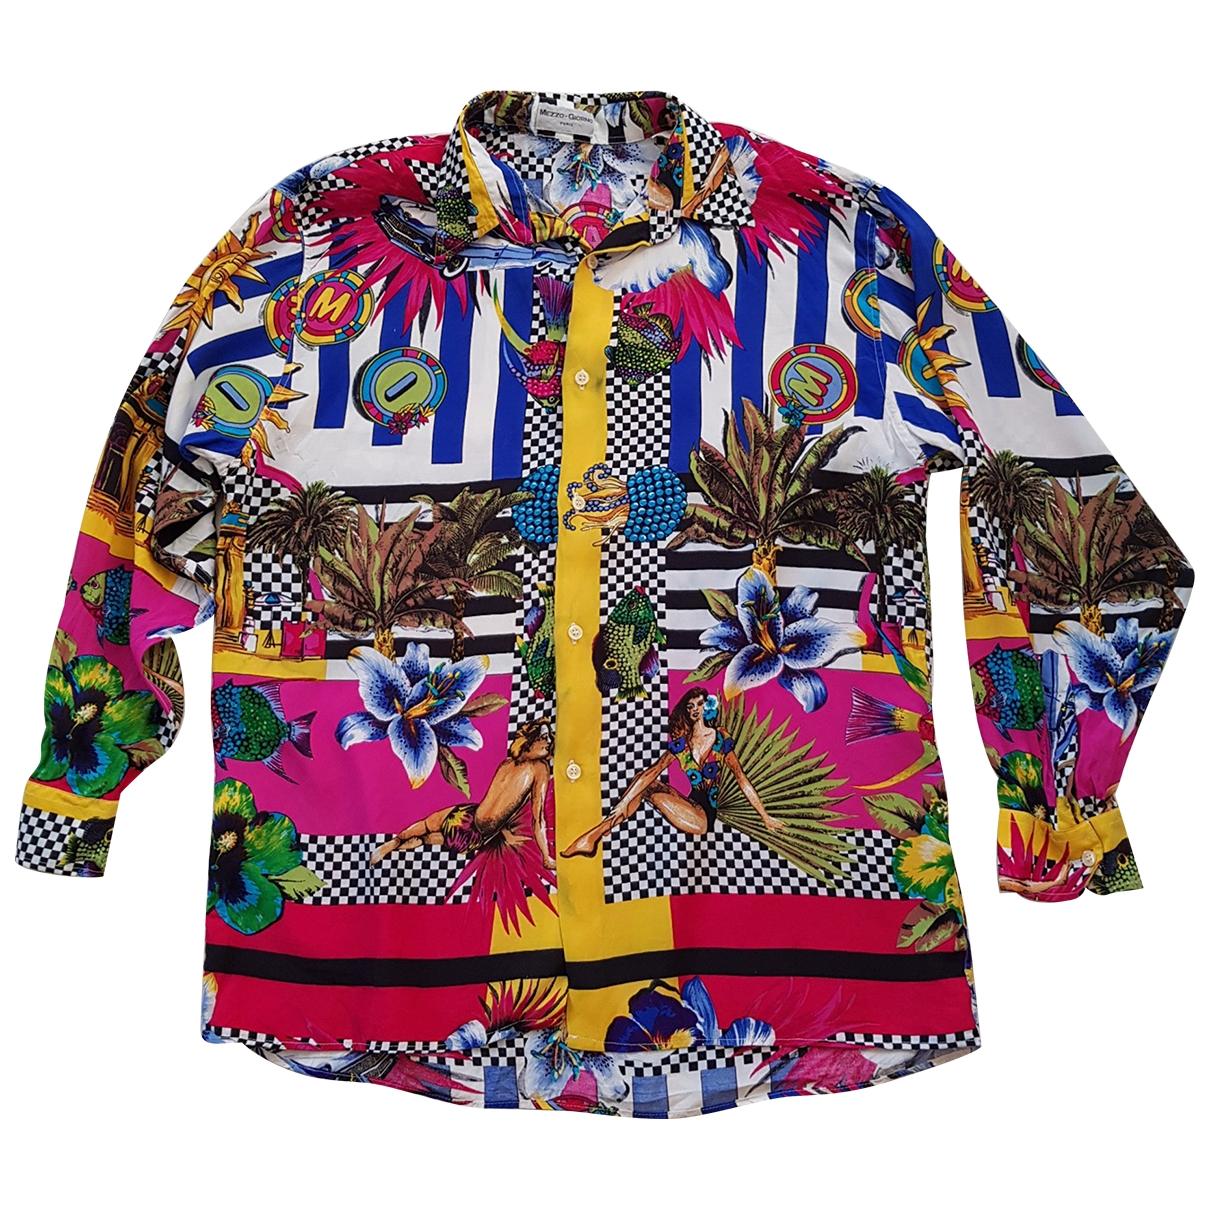 Non Signé / Unsigned Hippie Chic Multicolour Shirts for Men XL International